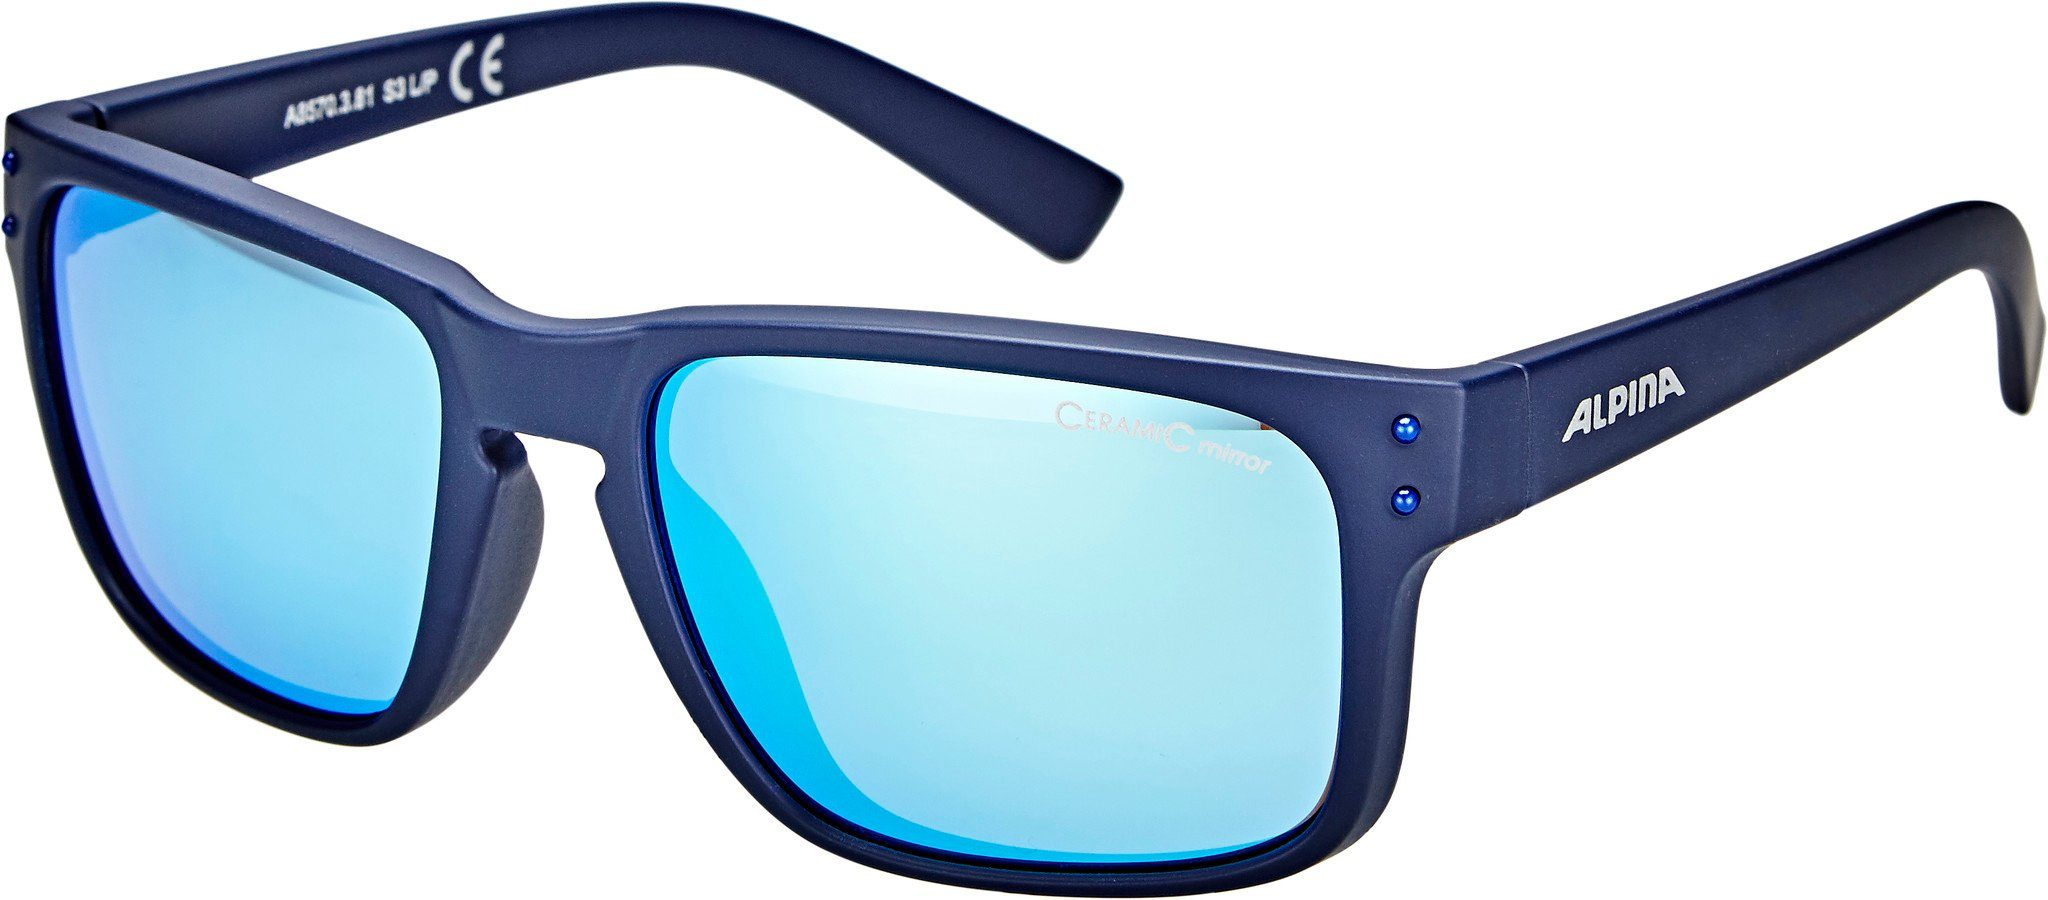 Alpina Sportbrille »Kosmic«